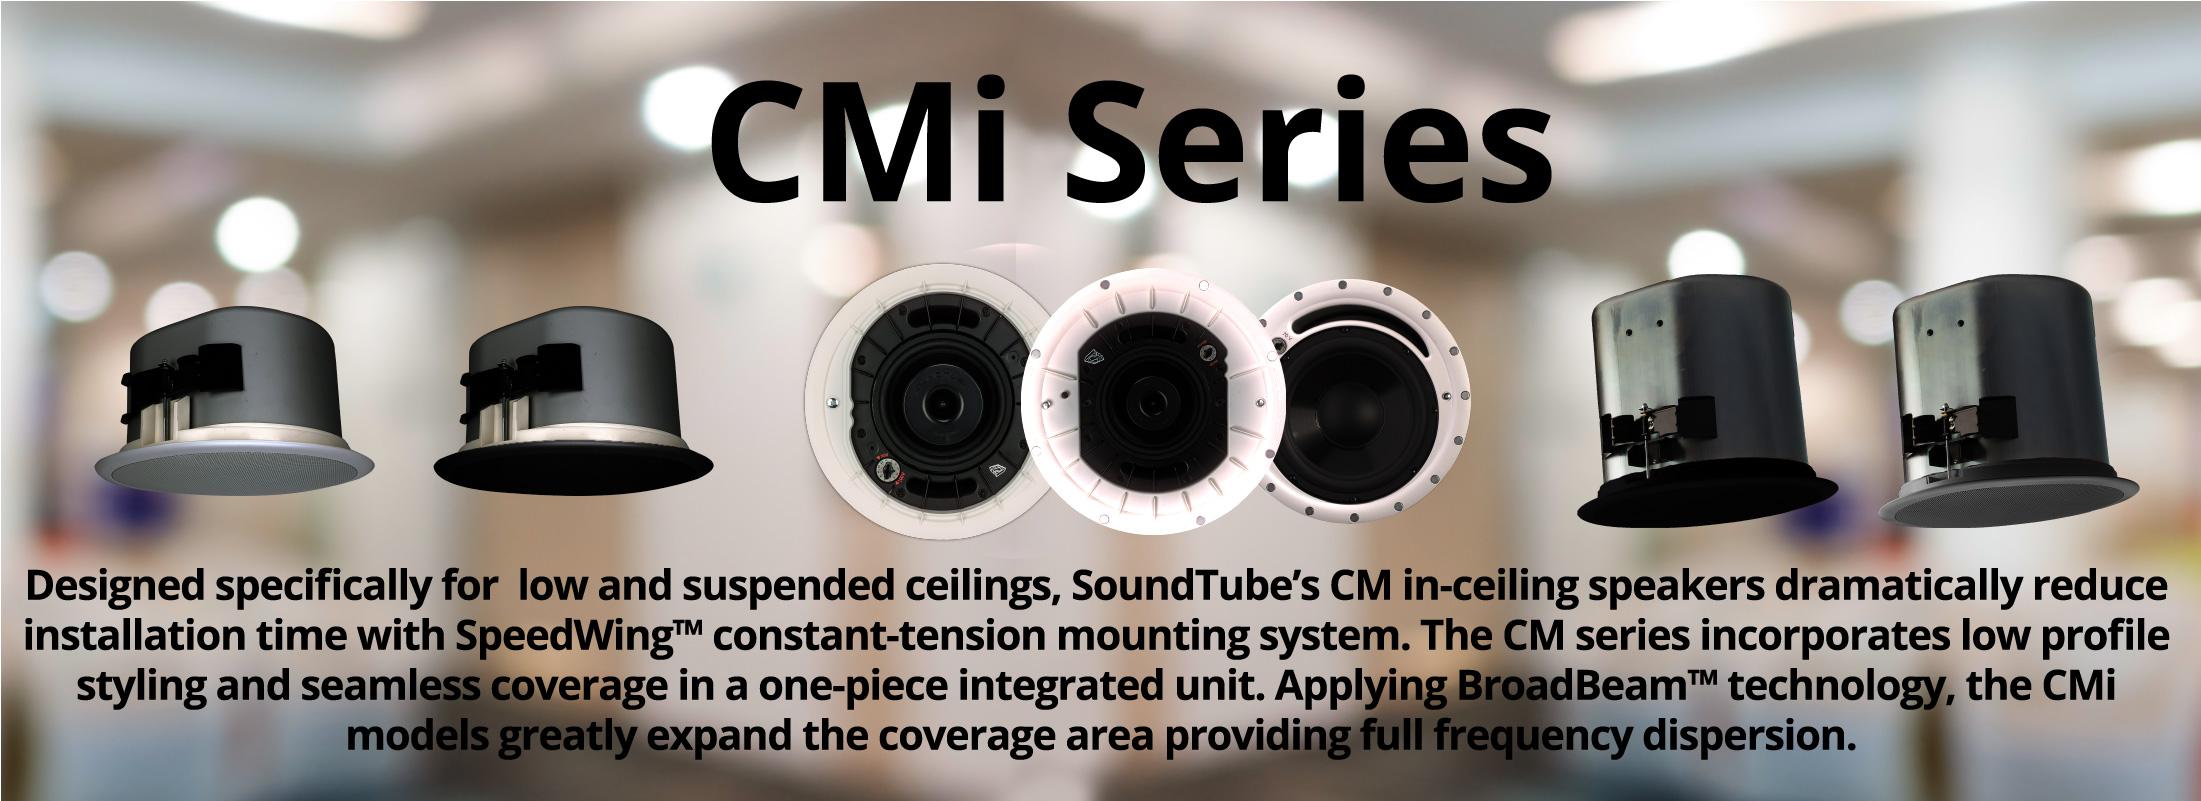 CMi-Series